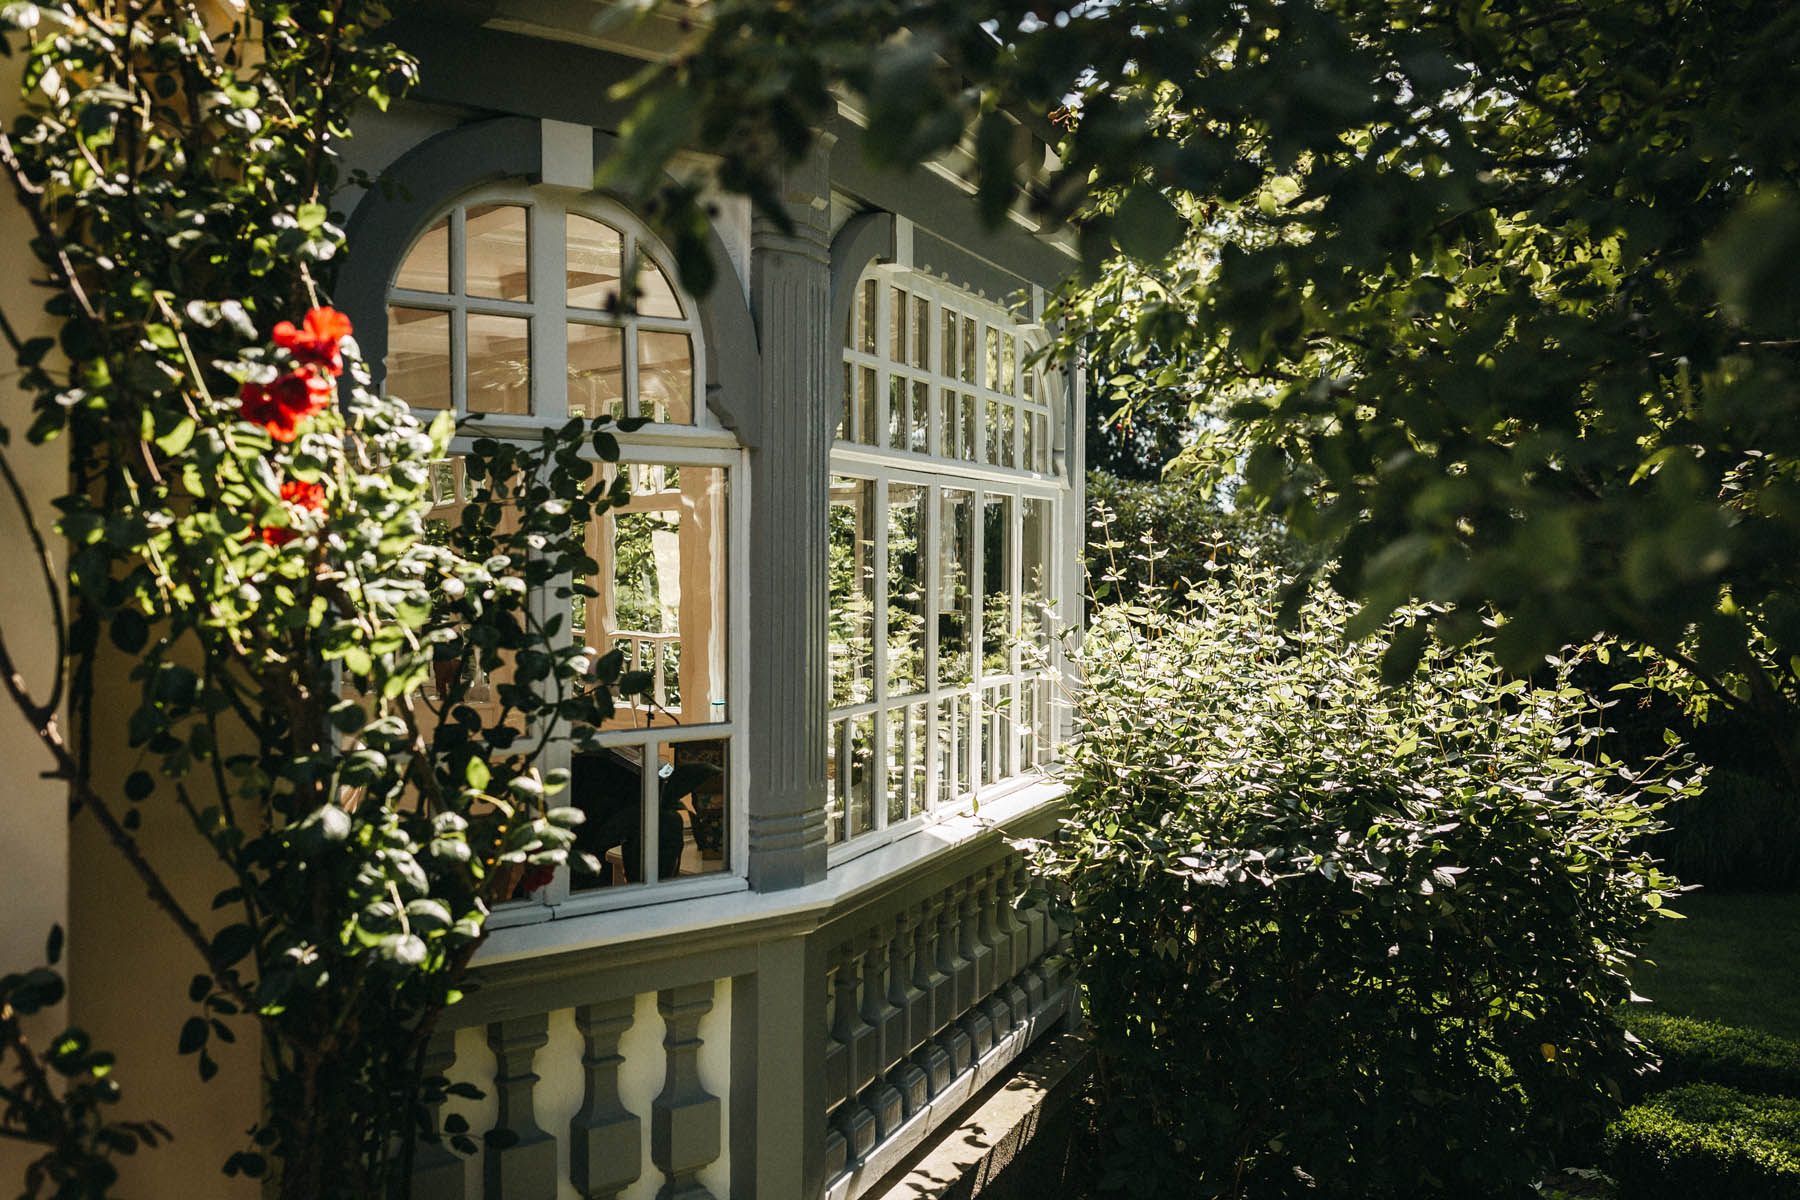 raissa simon fotografie hochzeit vintage starnberger see la villa 004 - Patricia + Maximilian